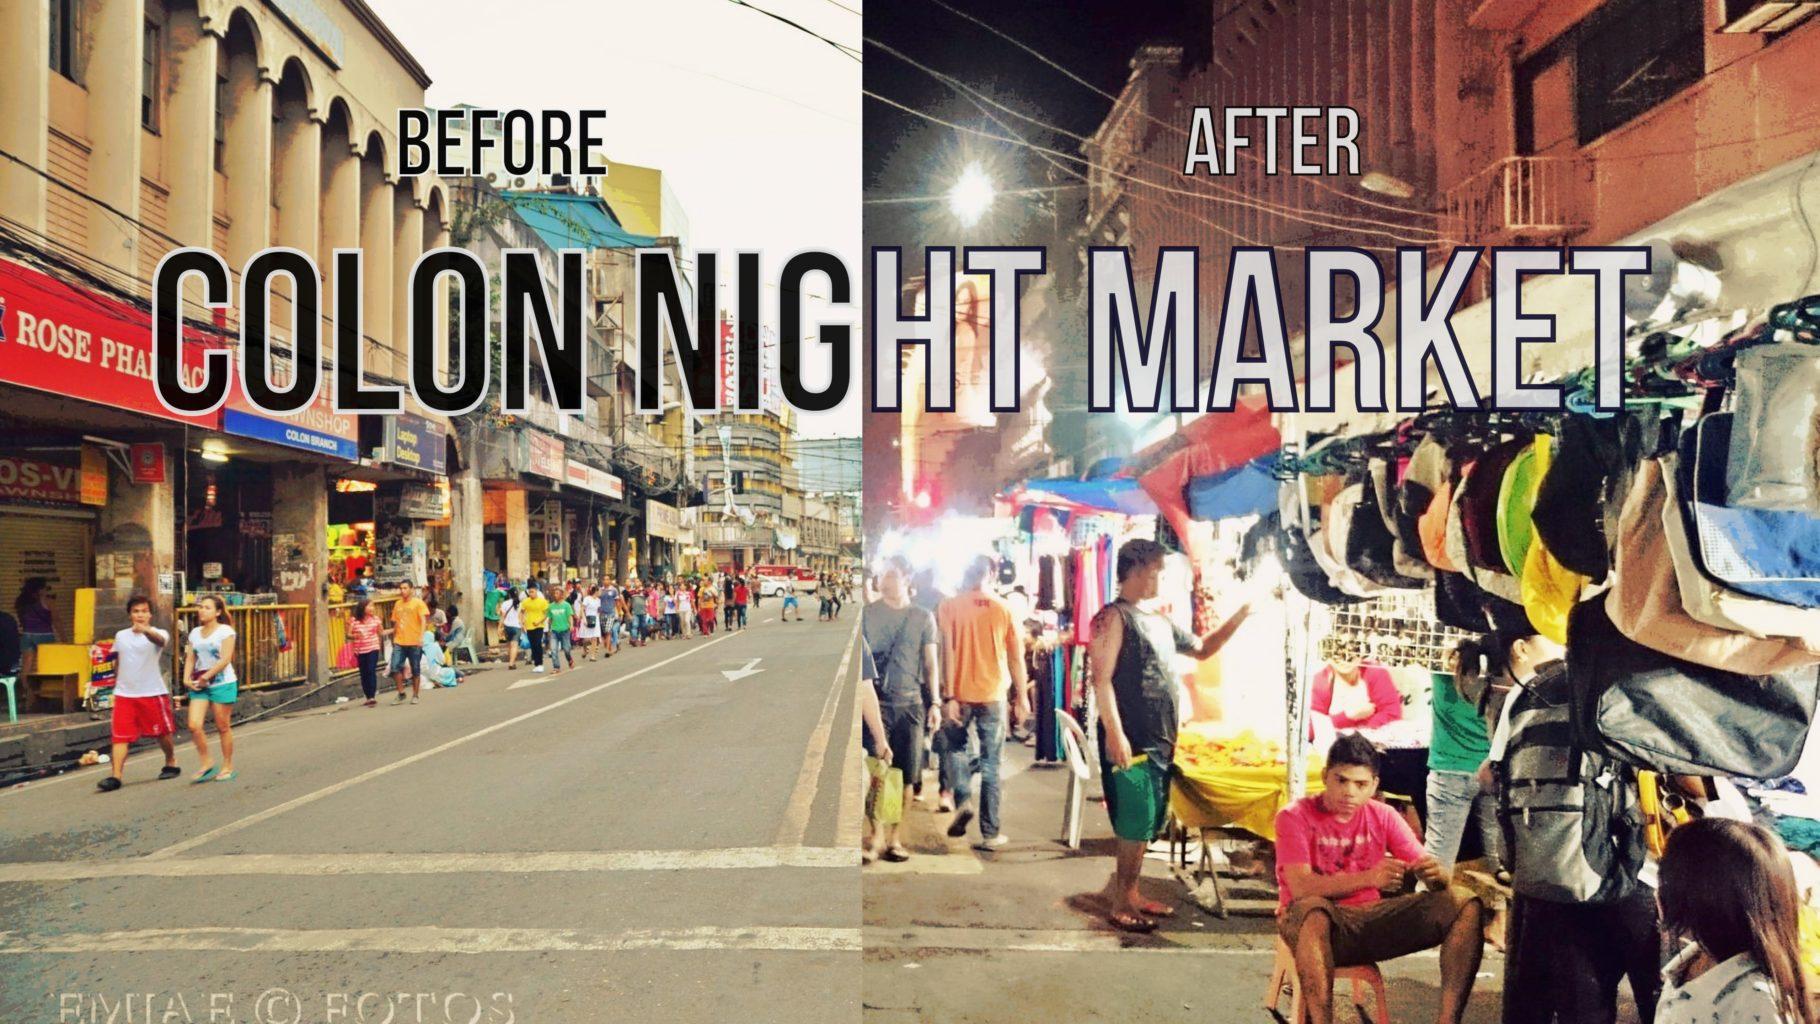 feature-2-colon-night-market-cebu-transformation